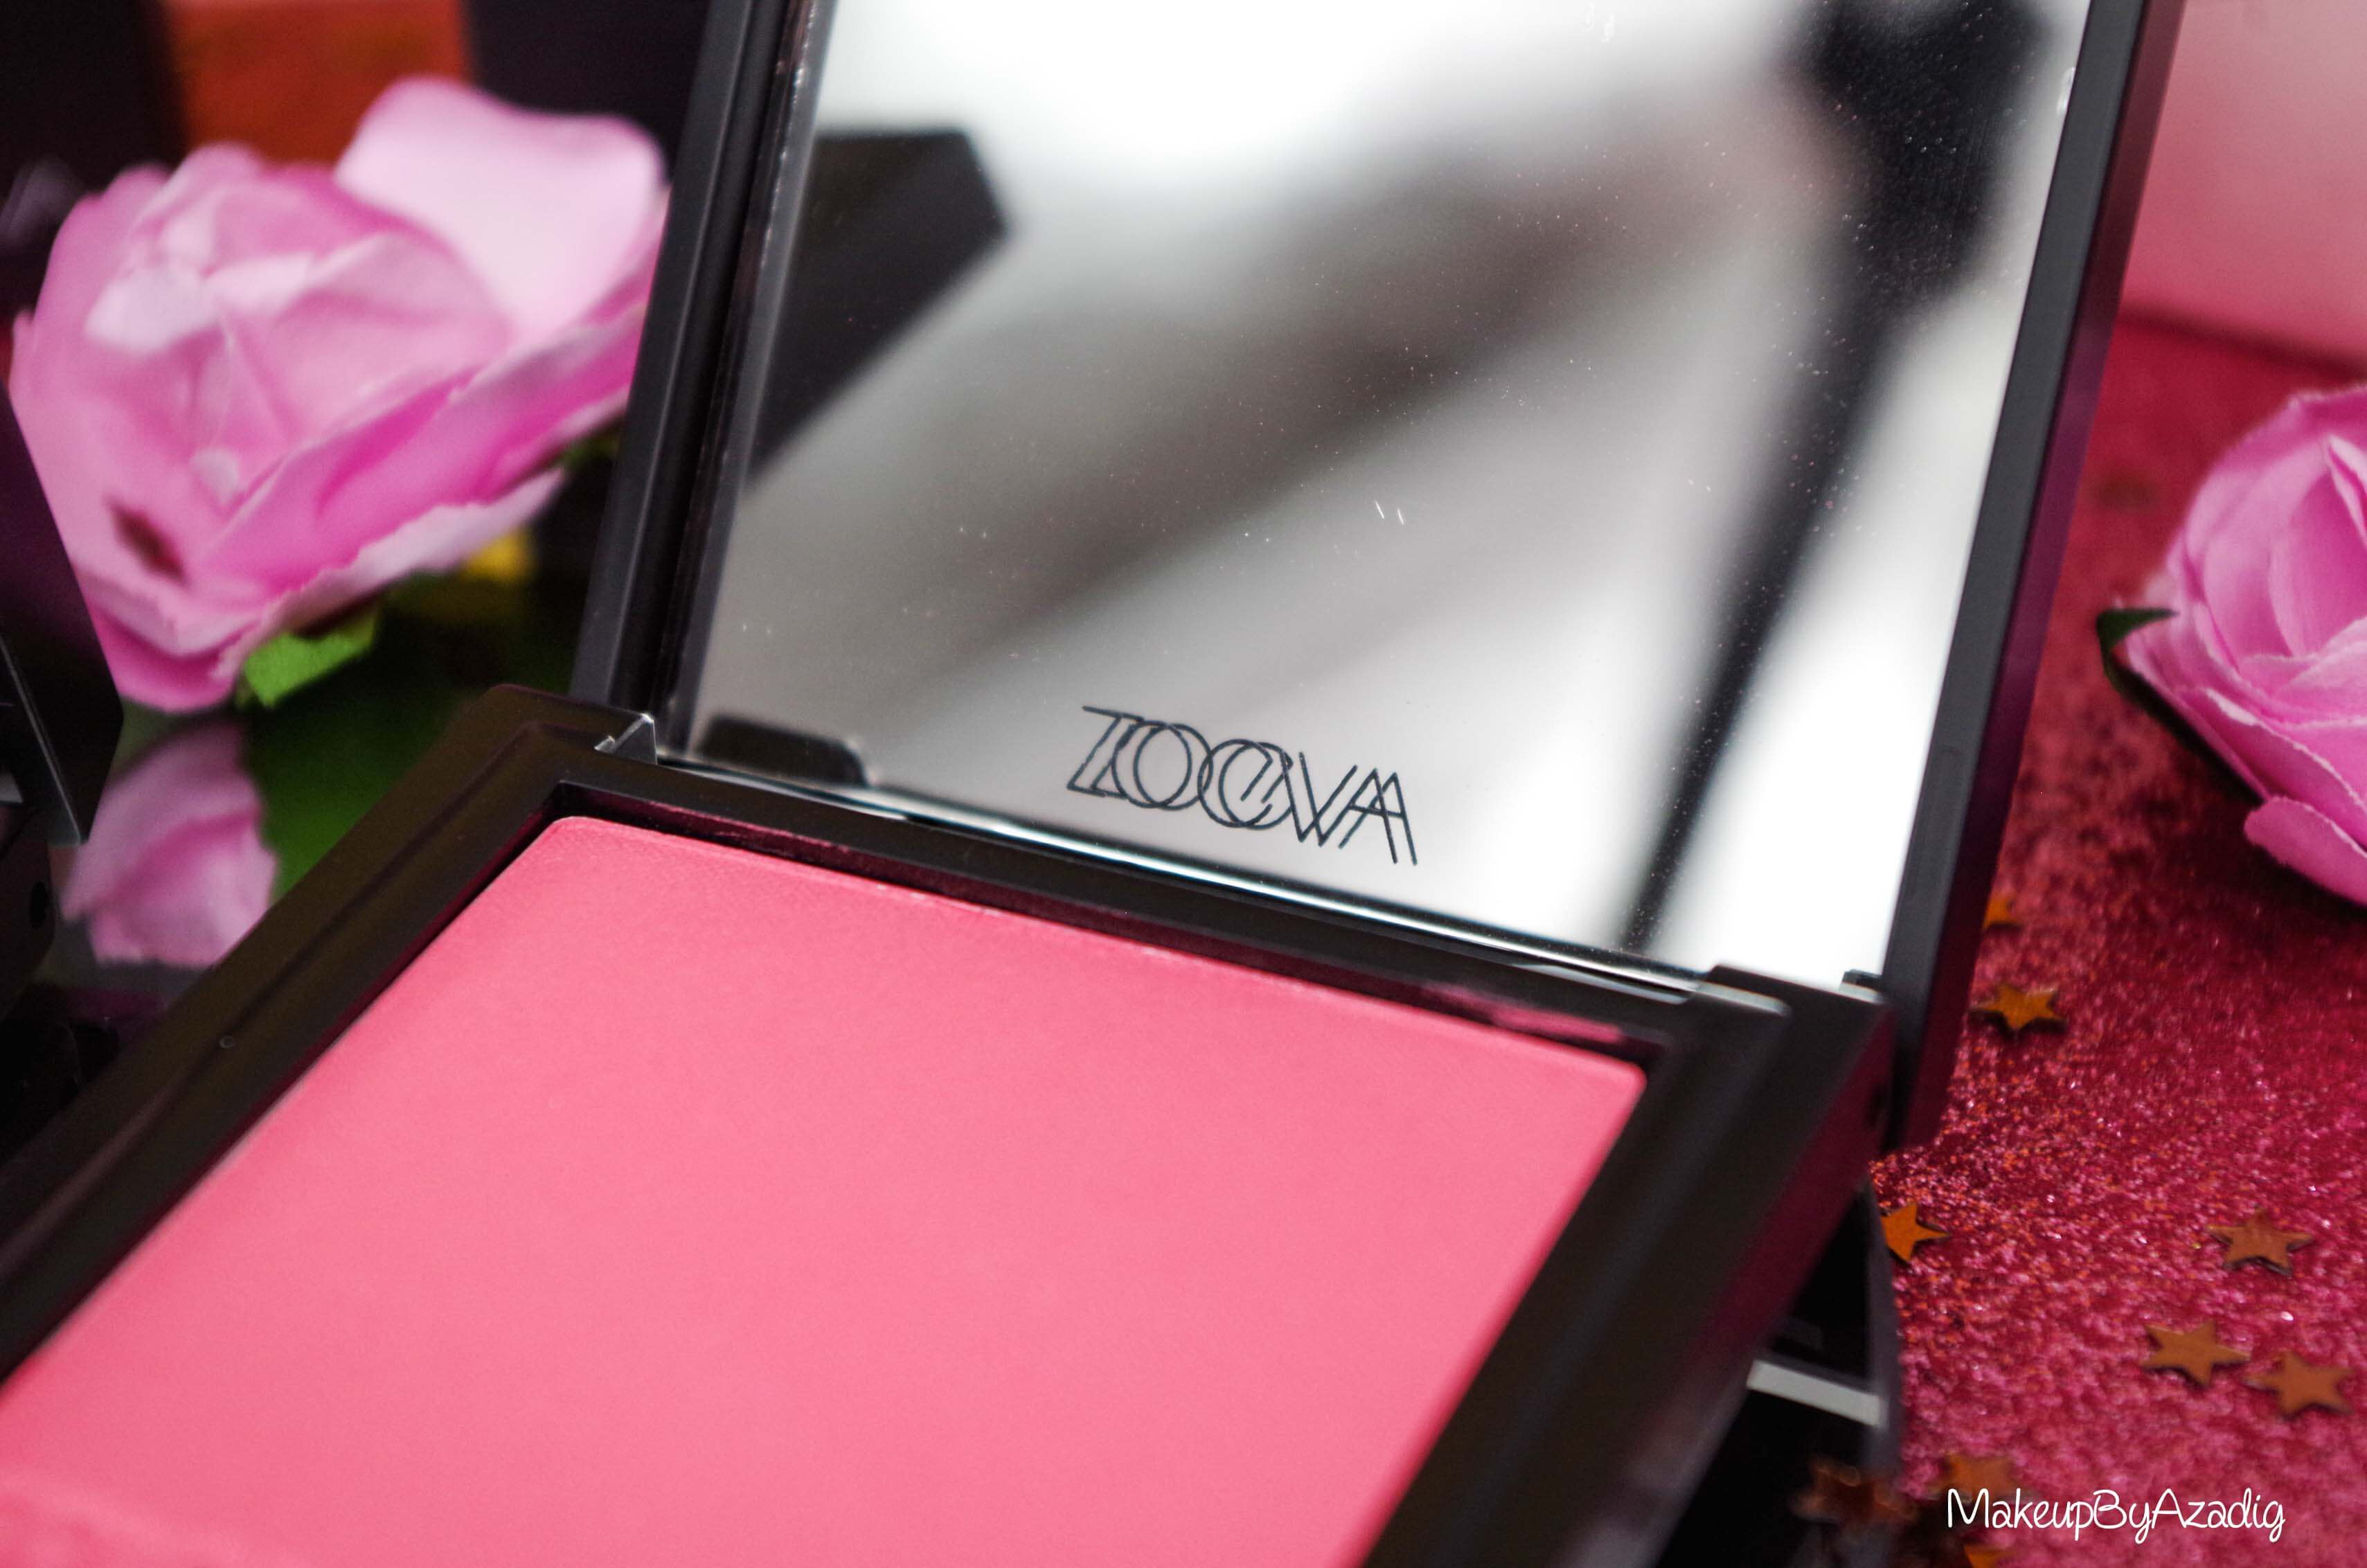 revue-review-luxe-color-blush-zoeva-sephora-france-helovesmemaybe-rush-rush-avis-swatch-makeupbyazadig-paris-offert